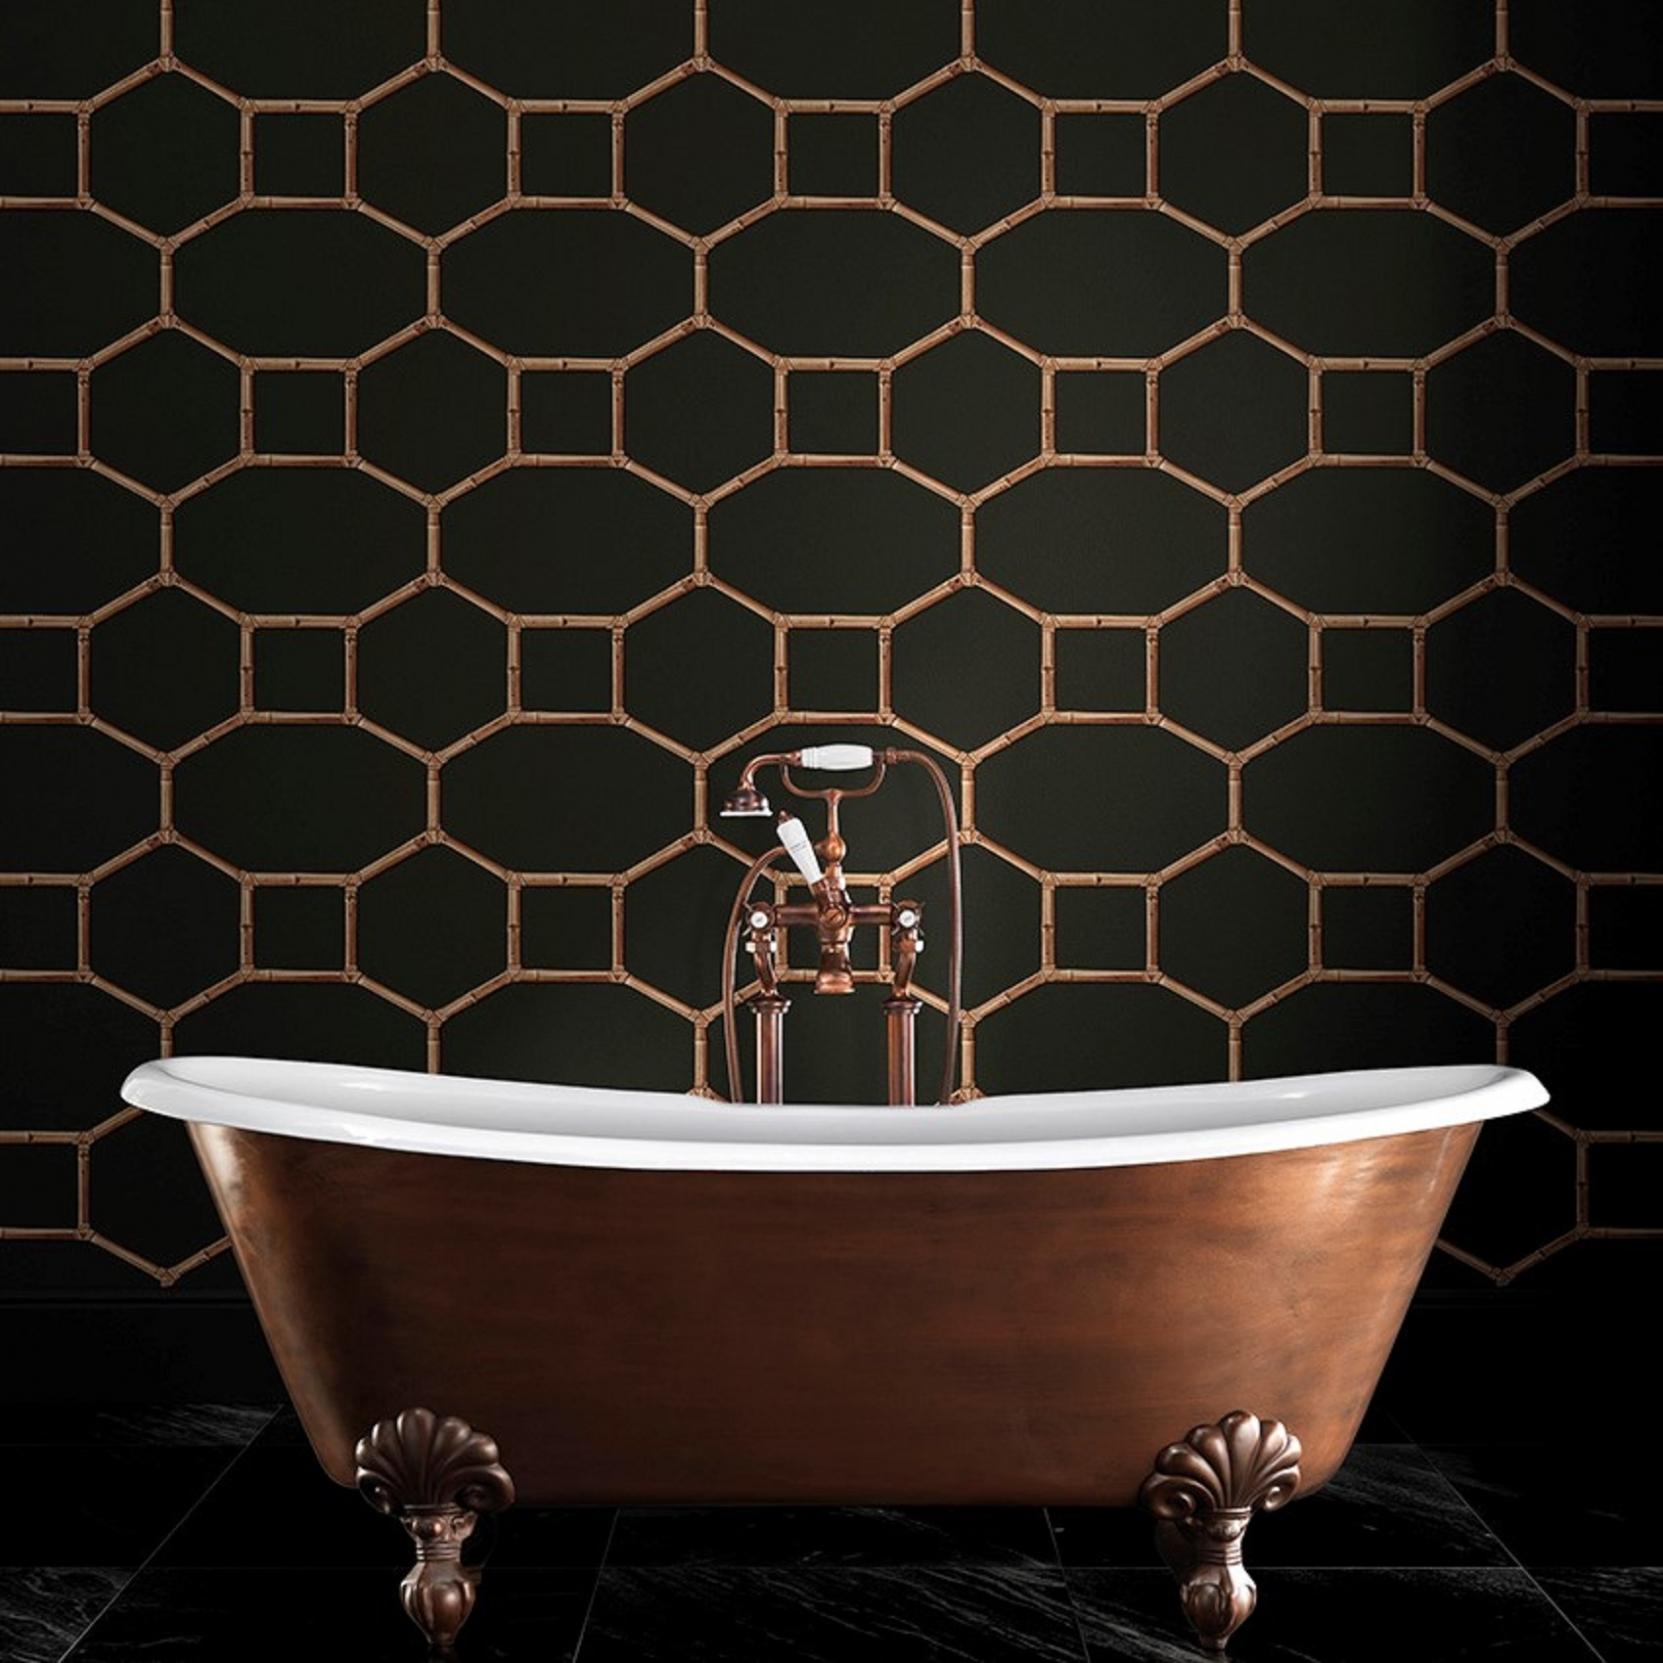 devon devon bamboo wallpaper tattahome. Black Bedroom Furniture Sets. Home Design Ideas